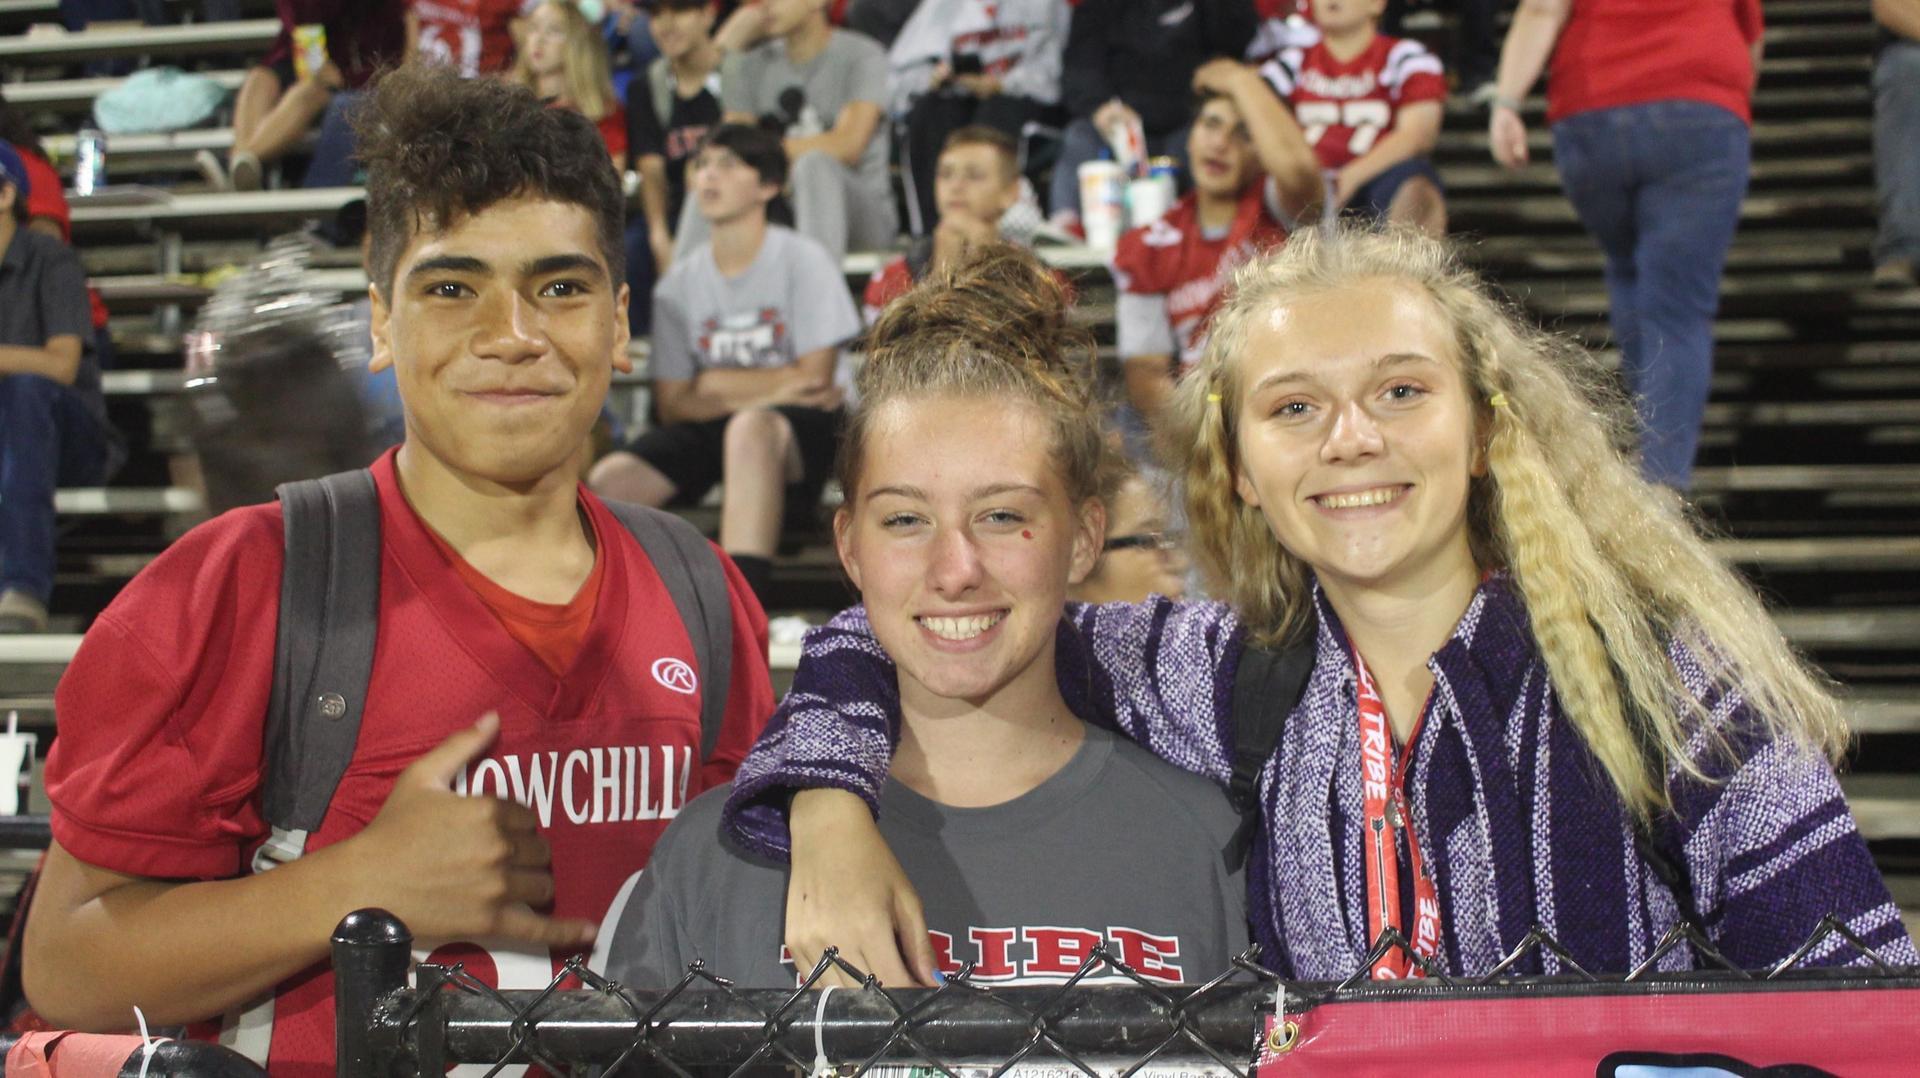 Students enjoying Chowchilla High School events.